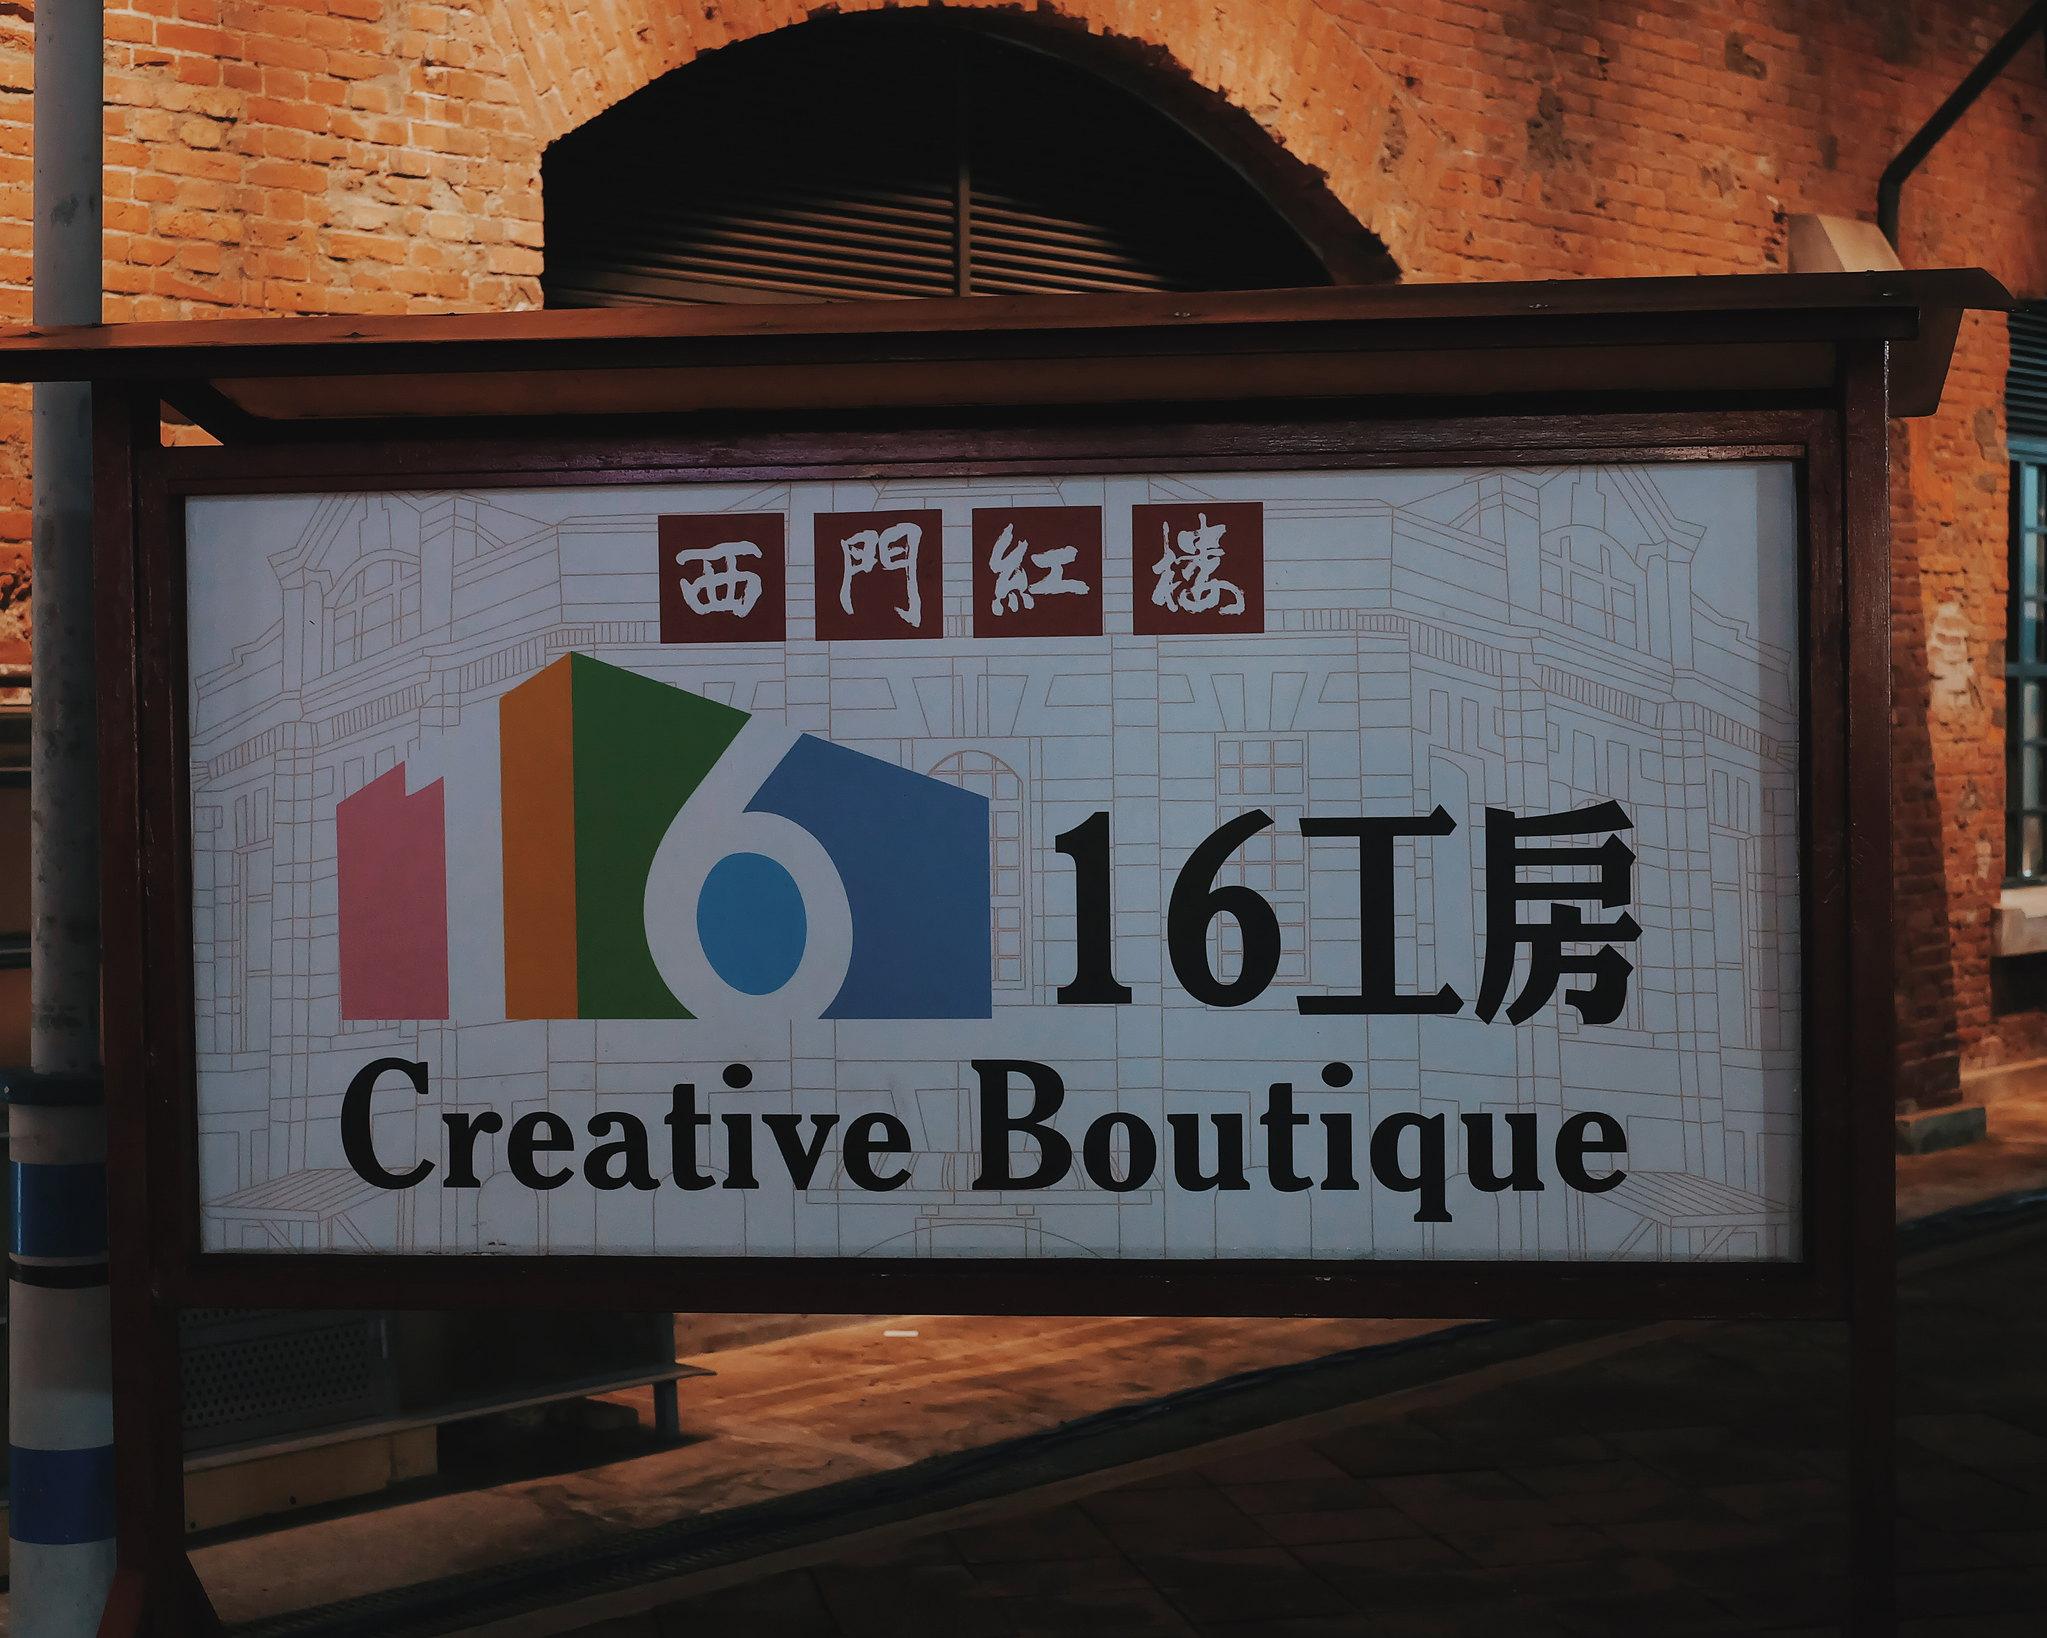 16 creative boutique